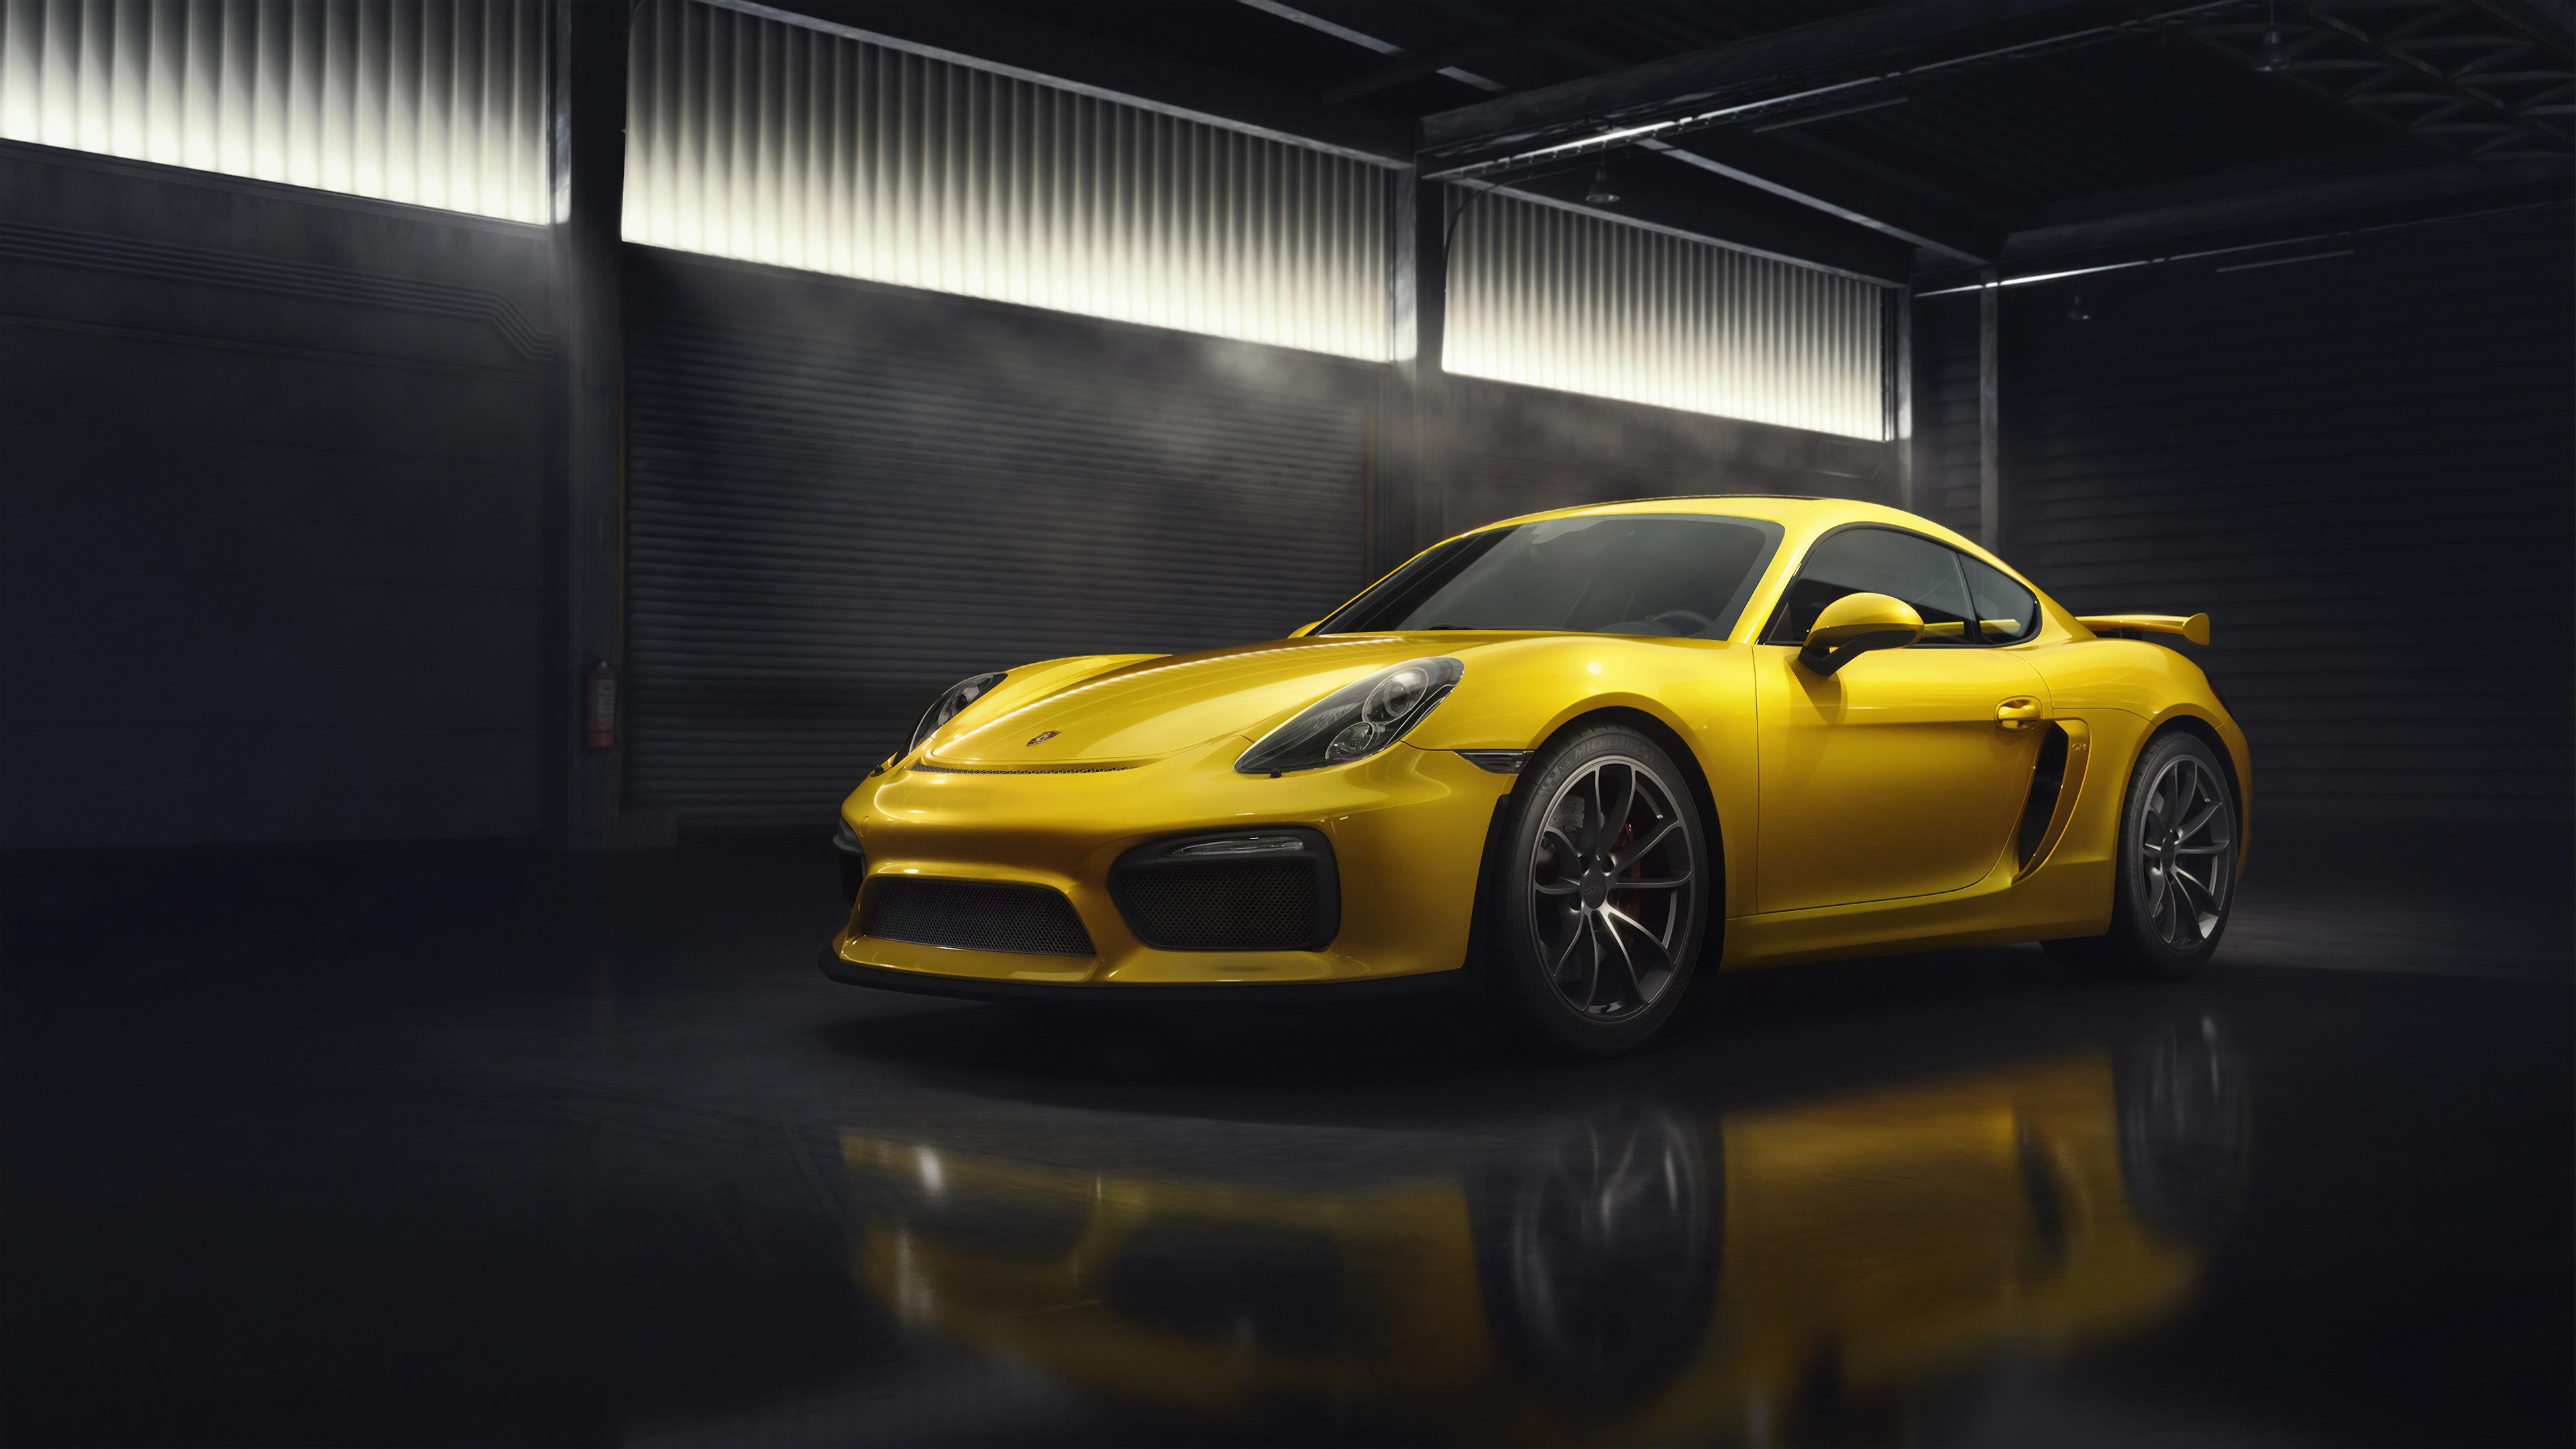 yellow porsche 2019 1565054969 - Yellow Porsche 2019 - porsche wallpapers, hd-wallpapers, cars wallpapers, 4k-wallpapers